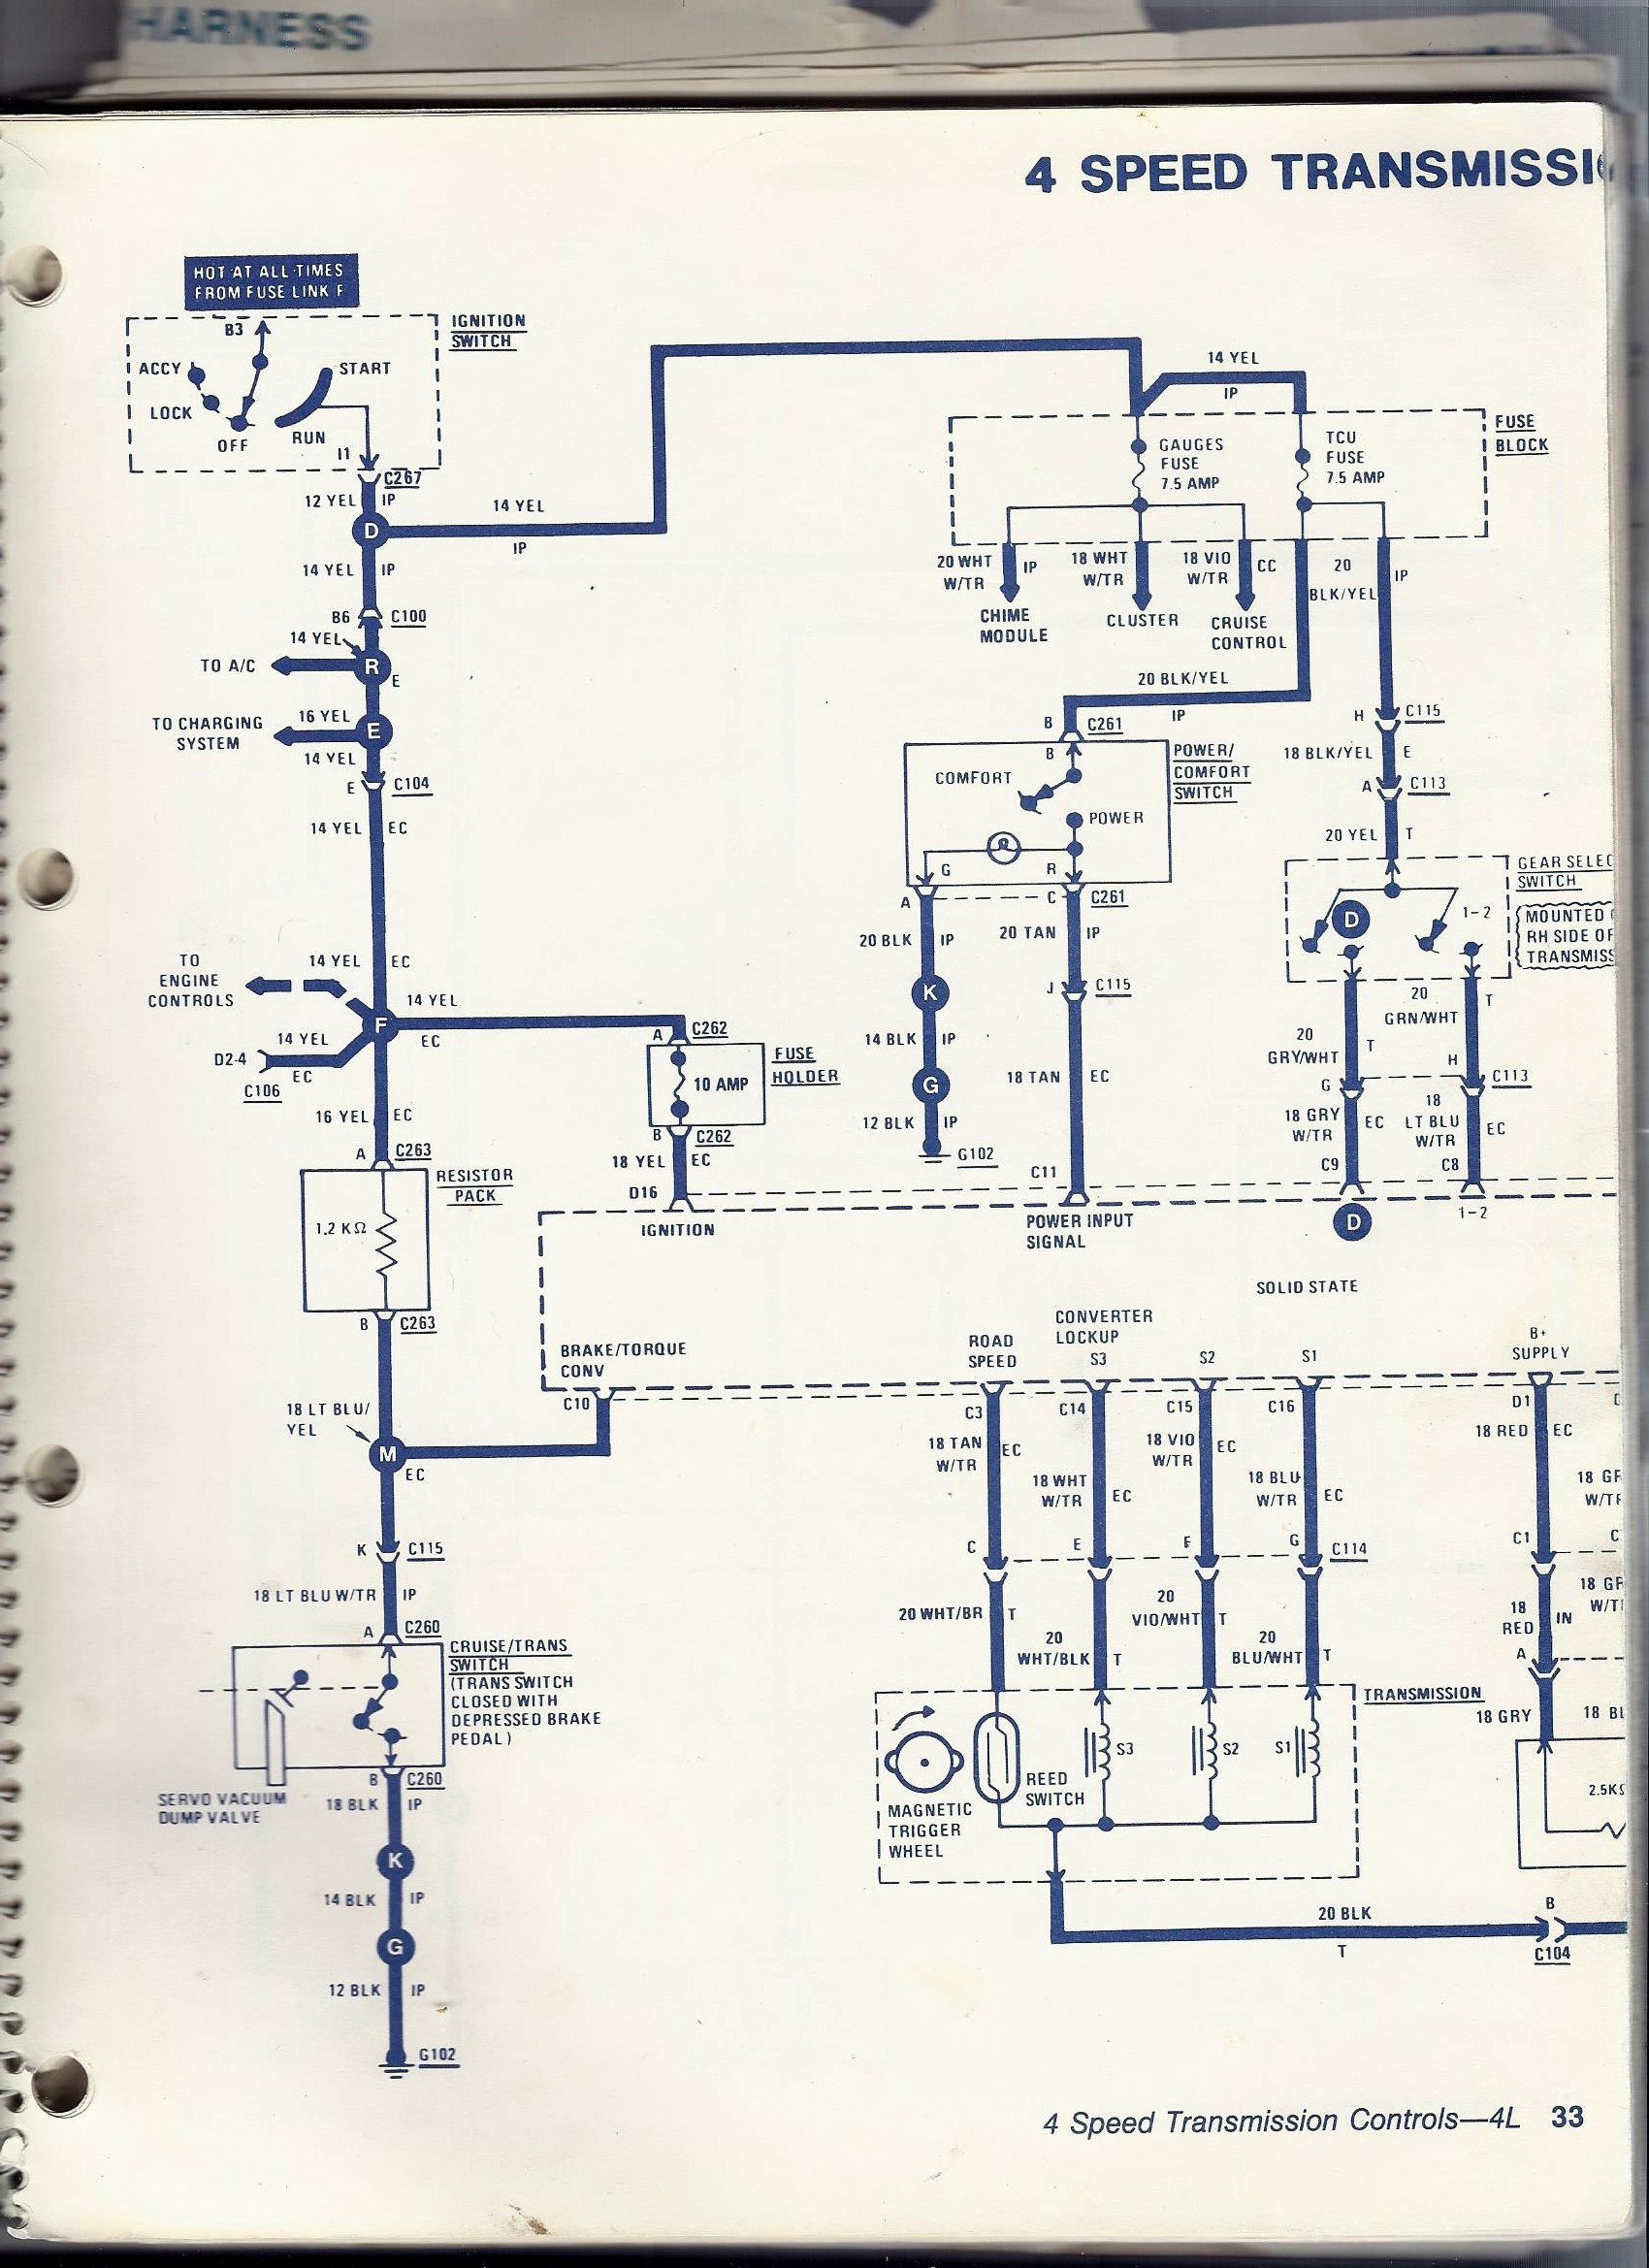 302231d1497829972 aw4 wiring diagram tcc wiring fsm?resize\\\\\\\=665%2C915\\\\\\\&ssl\\\\\\\=1 daikin dch060 wiring diagram,dch \u2022 buccaneersvsrams co  at suagrazia.org